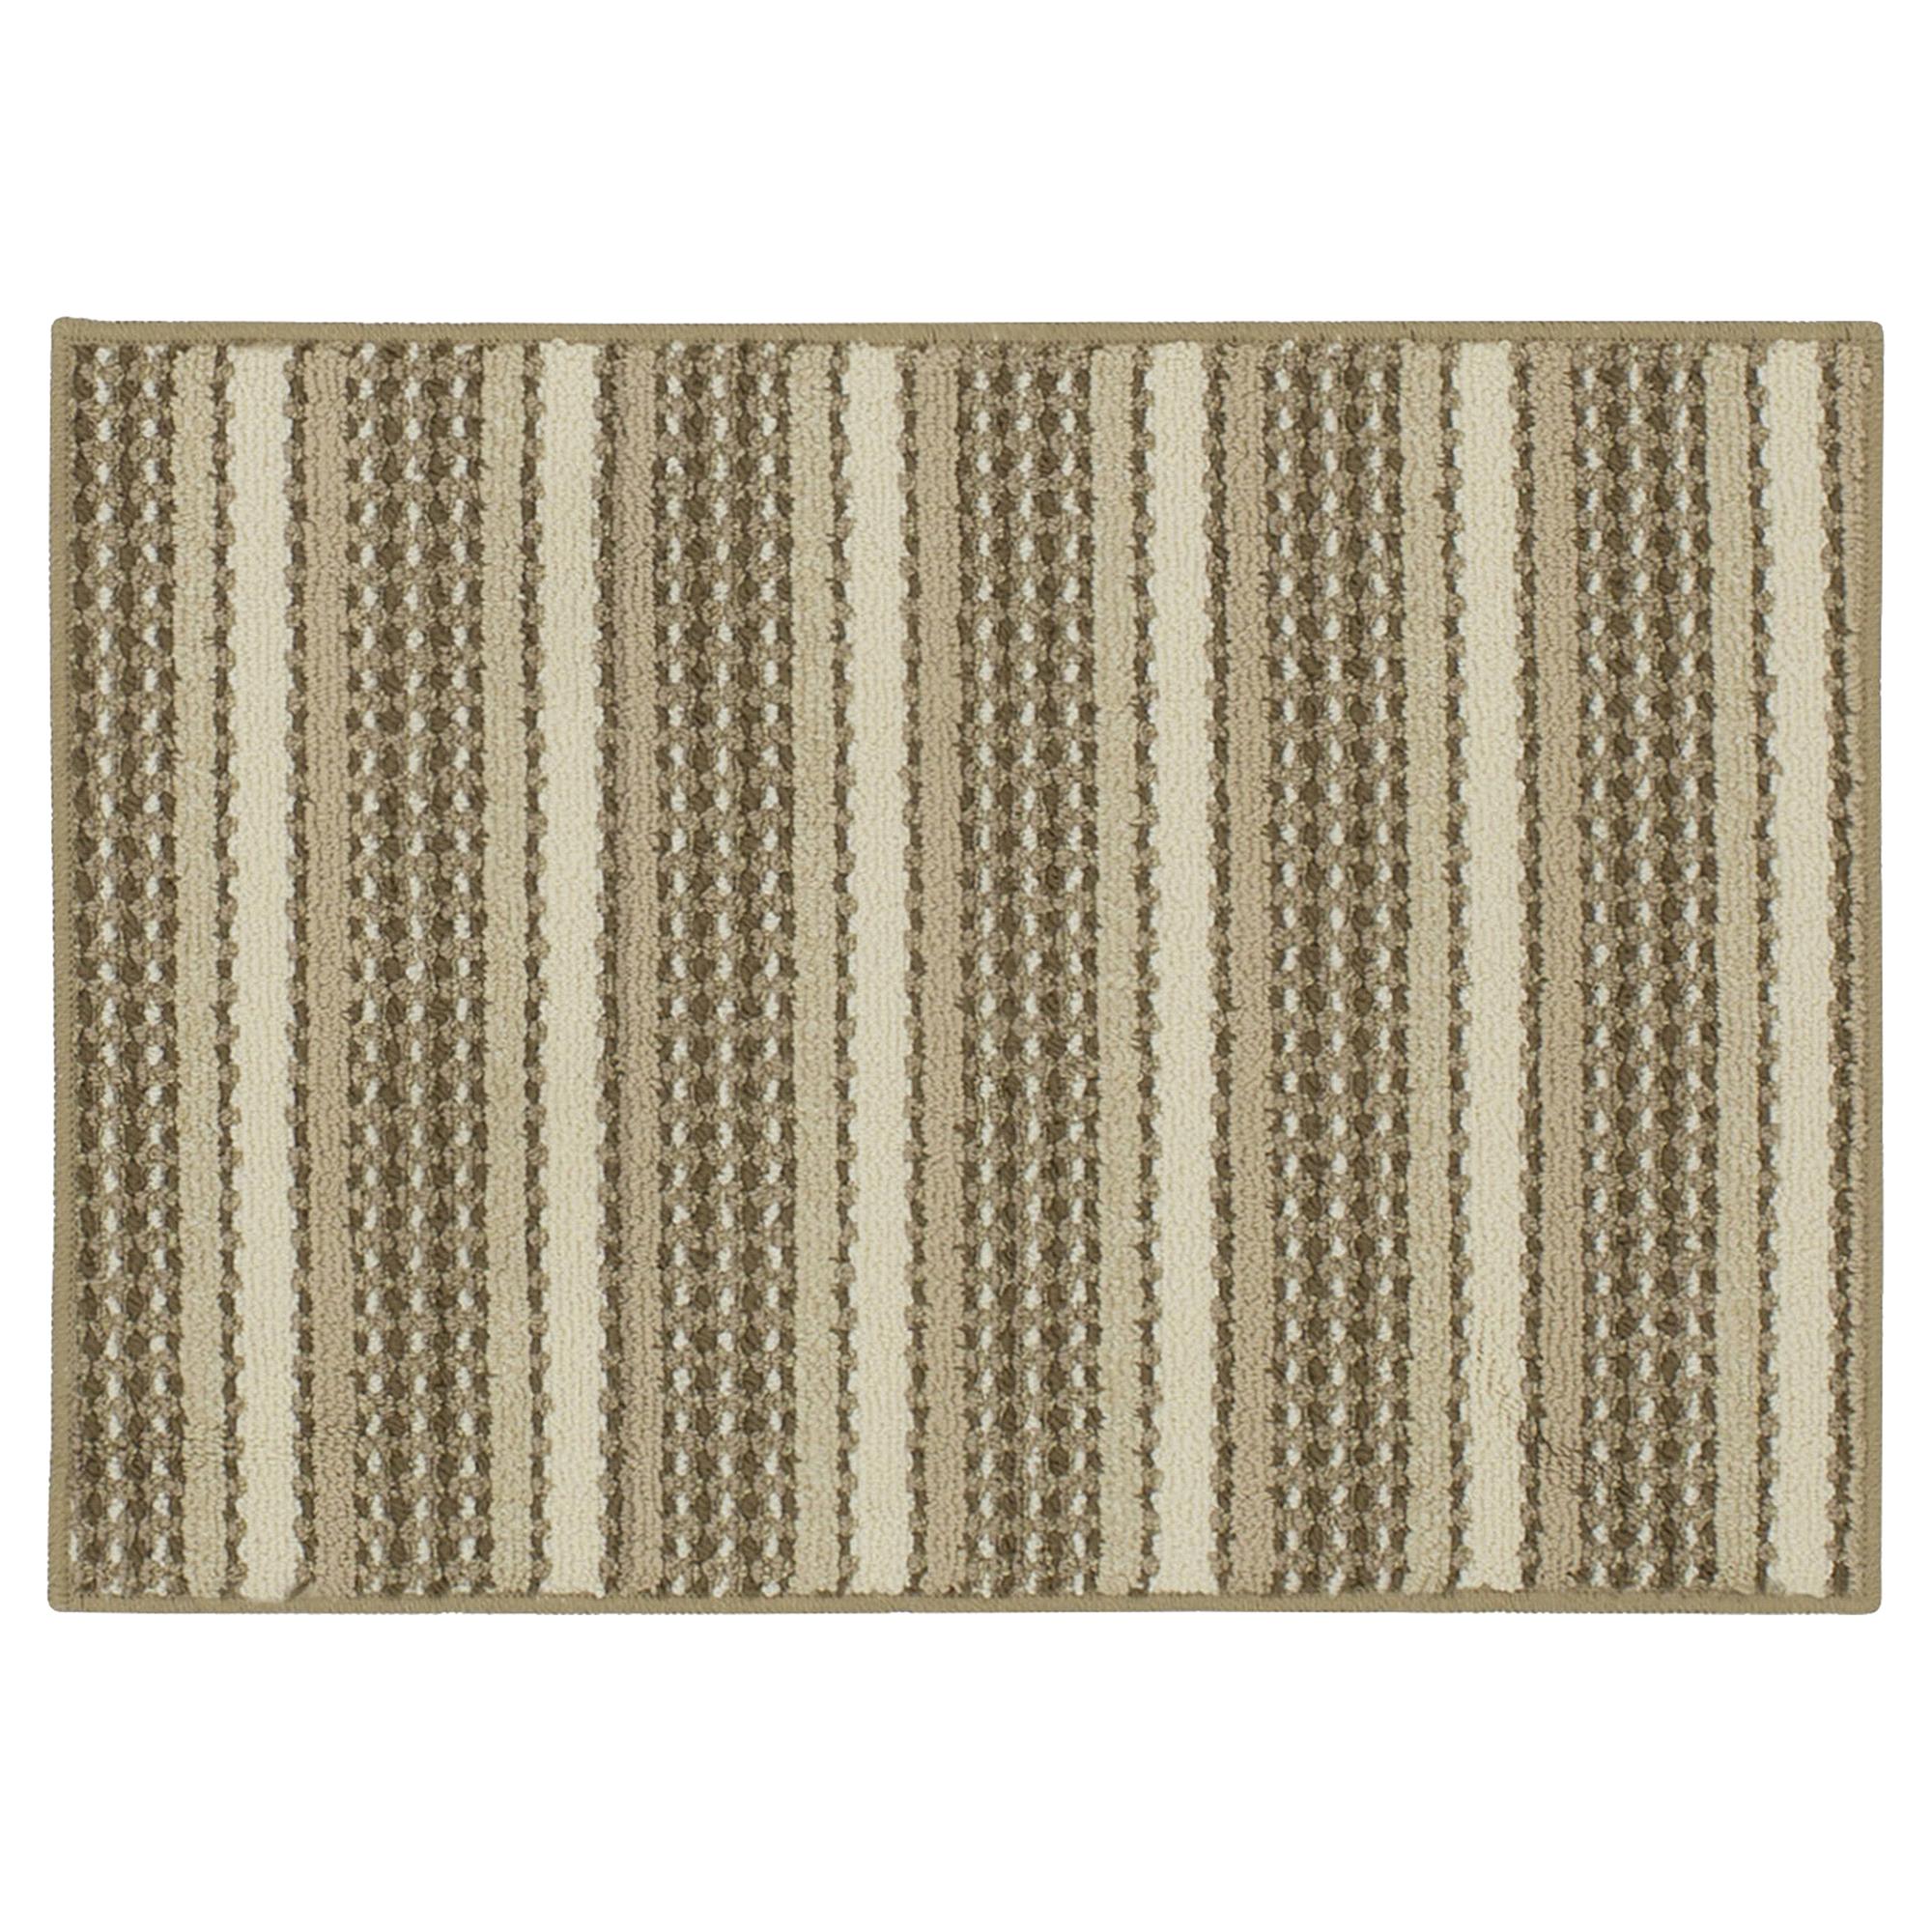 tampico lane sand stone rug 30x46 | meijer